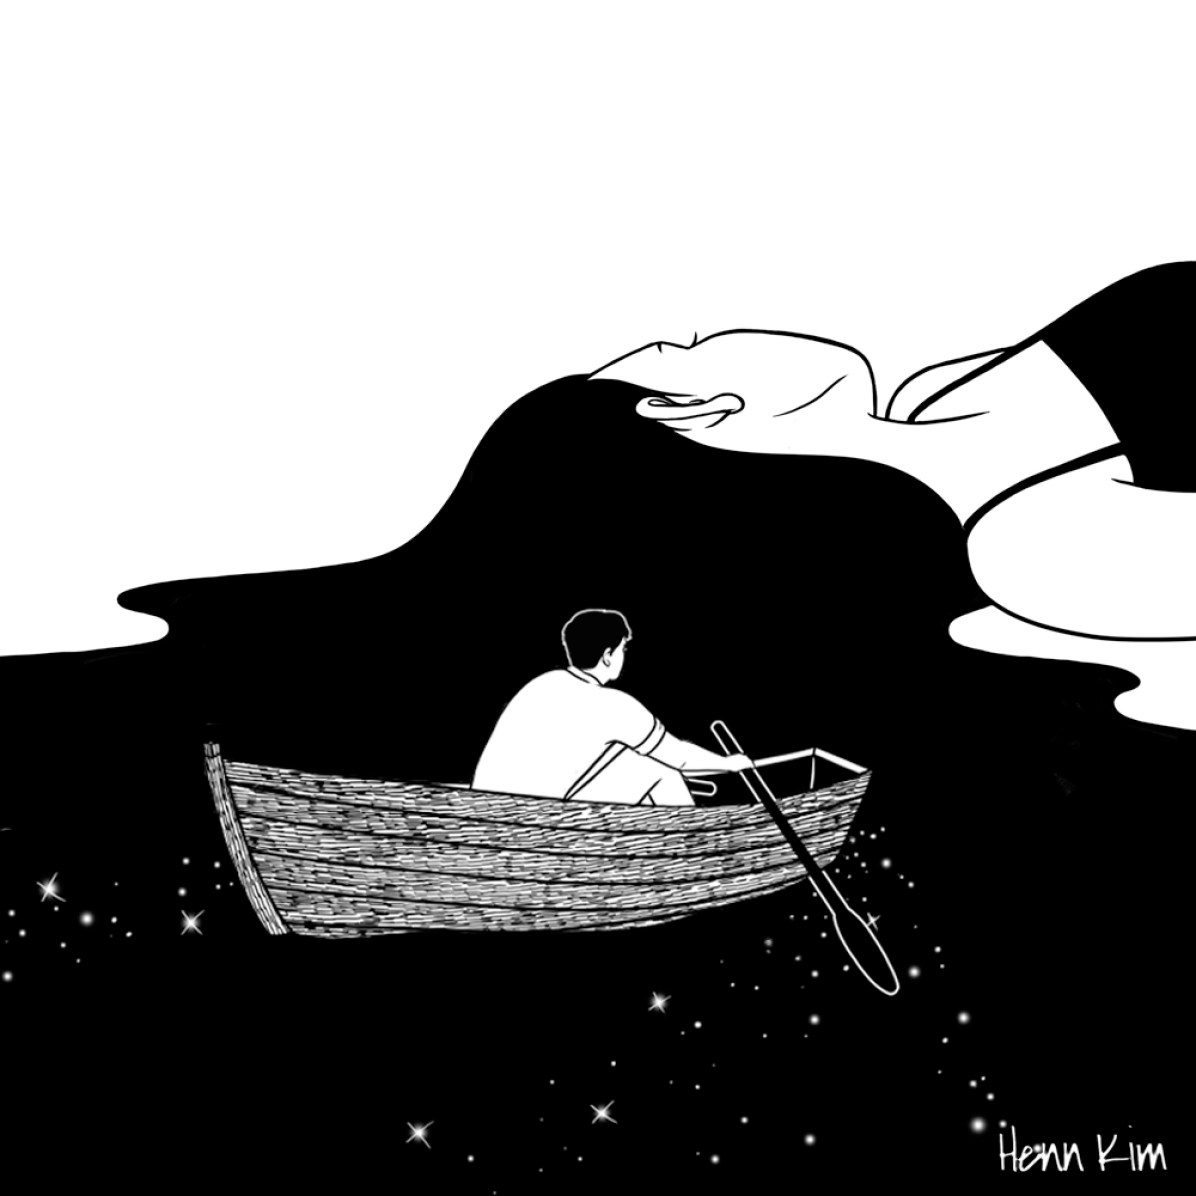 Rowing to you - Henn Kim